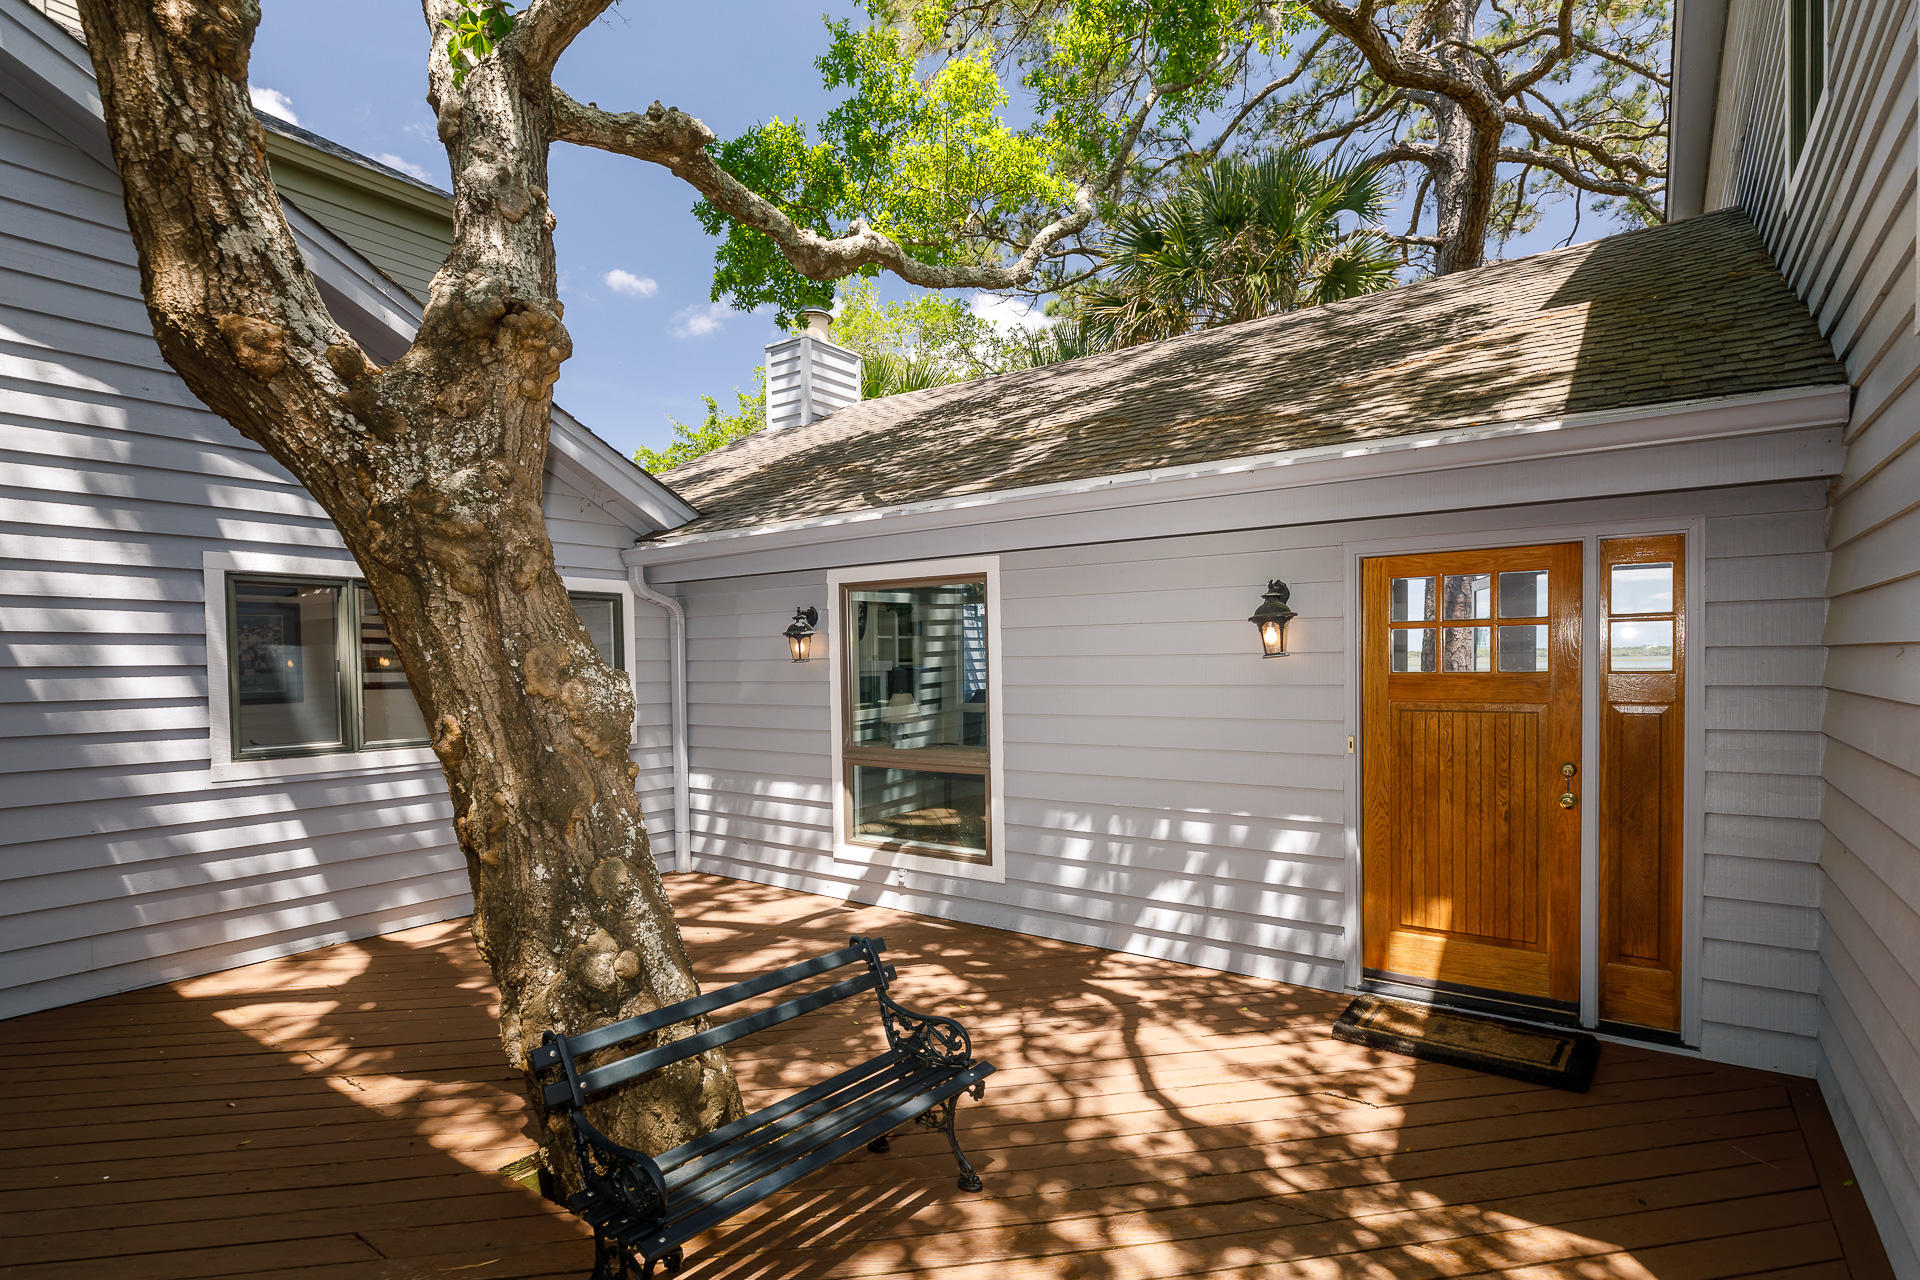 Kiawah Island Homes For Sale - 165 Marsh Hawk, Kiawah Island, SC - 8